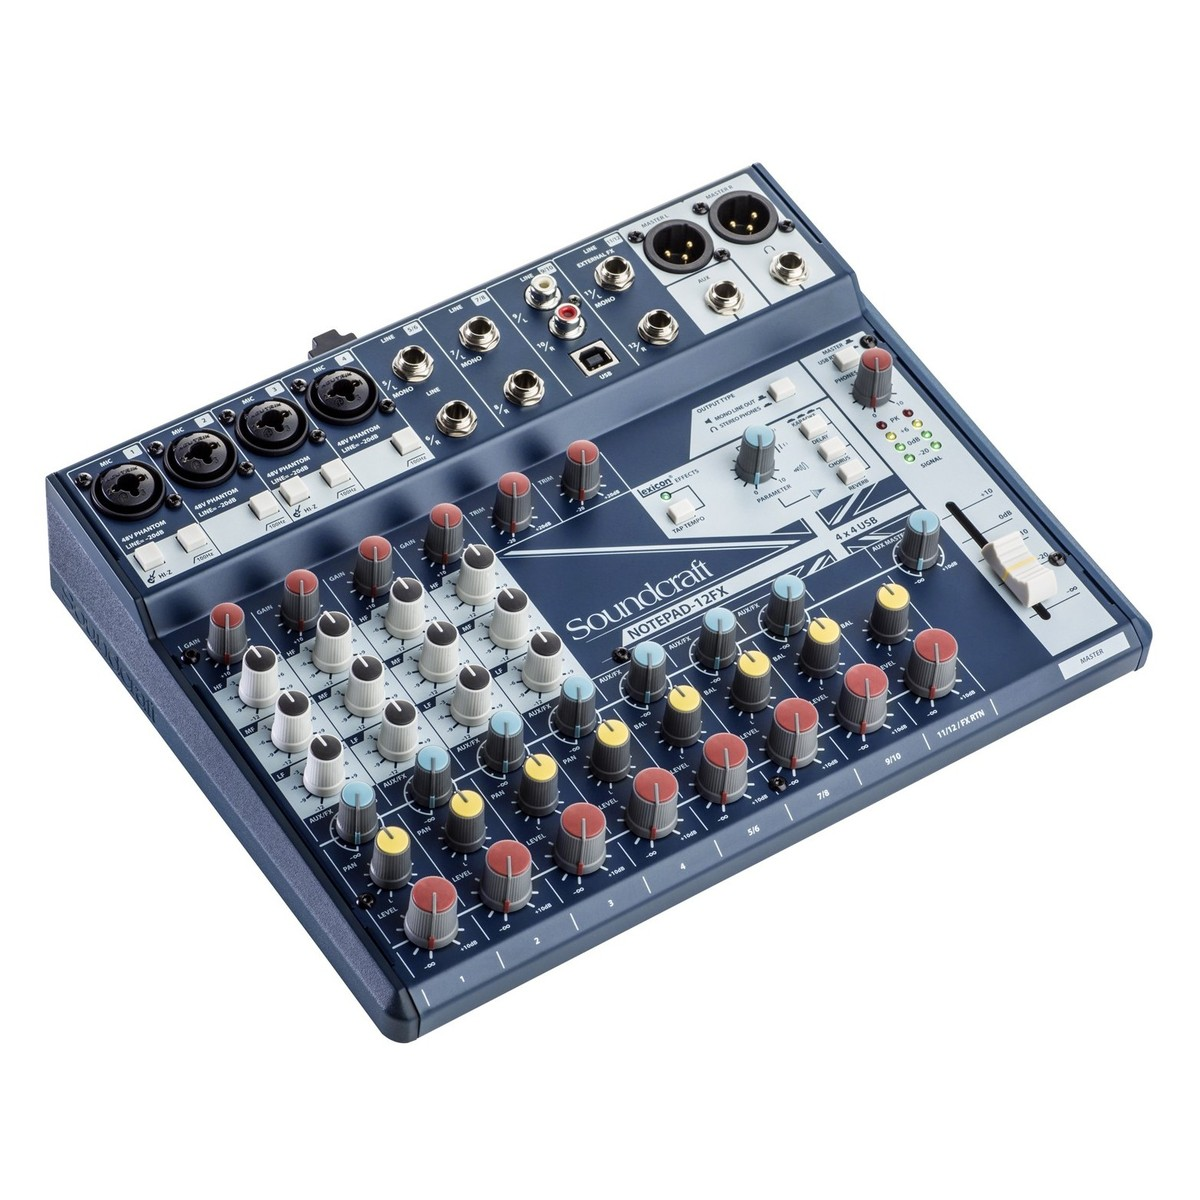 Soundcraft Notepad 12 Fx Analog Usb Mixer At Gear4music Cable Neutrik Xlr 1 4quot Combo Jacks And Phantom Power Sound Design Loading Zoom